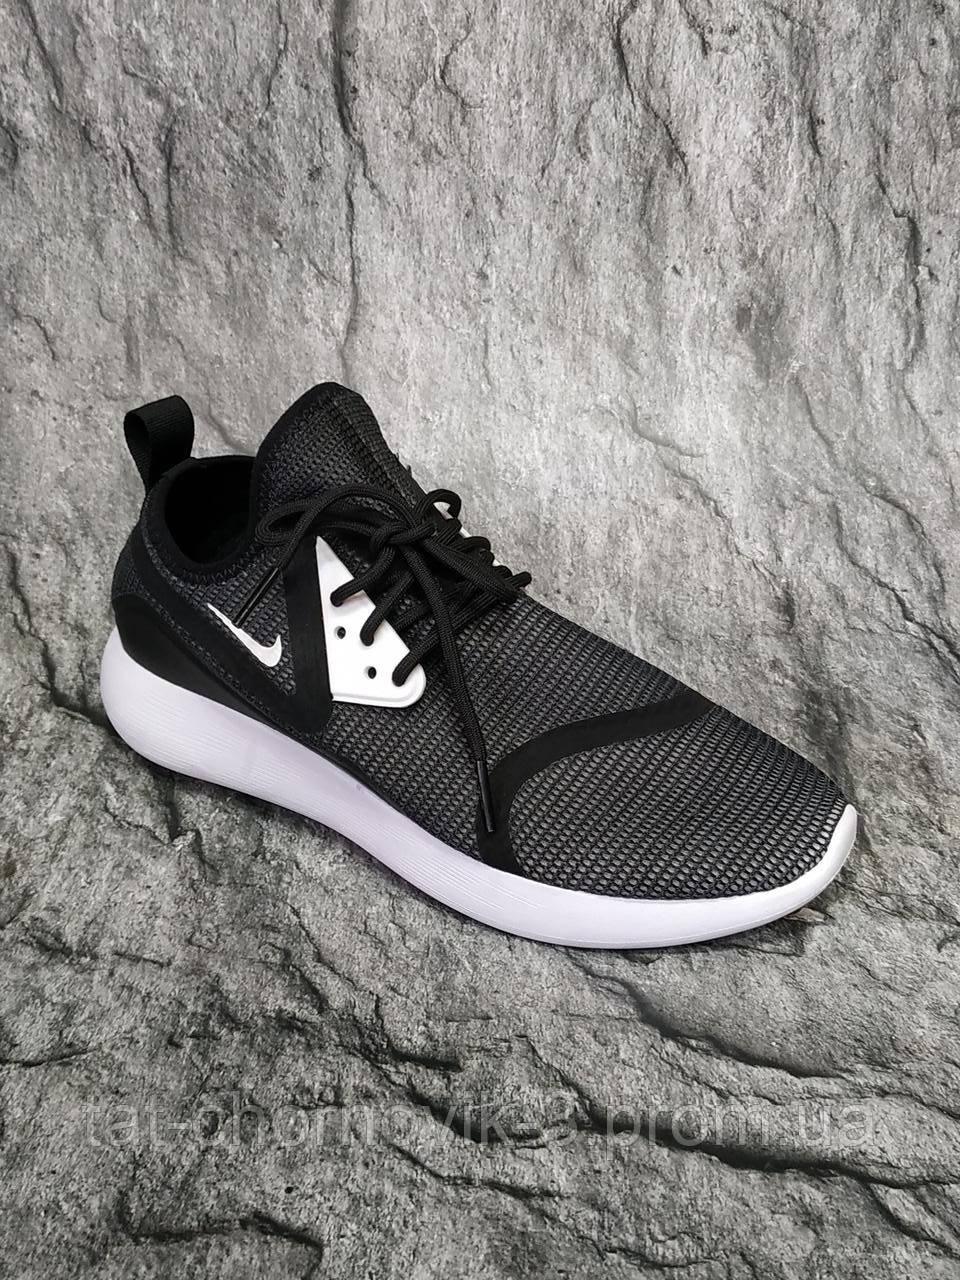 Мужские кроссовки Nike Lunarcharge Essential Uk Size 6.5